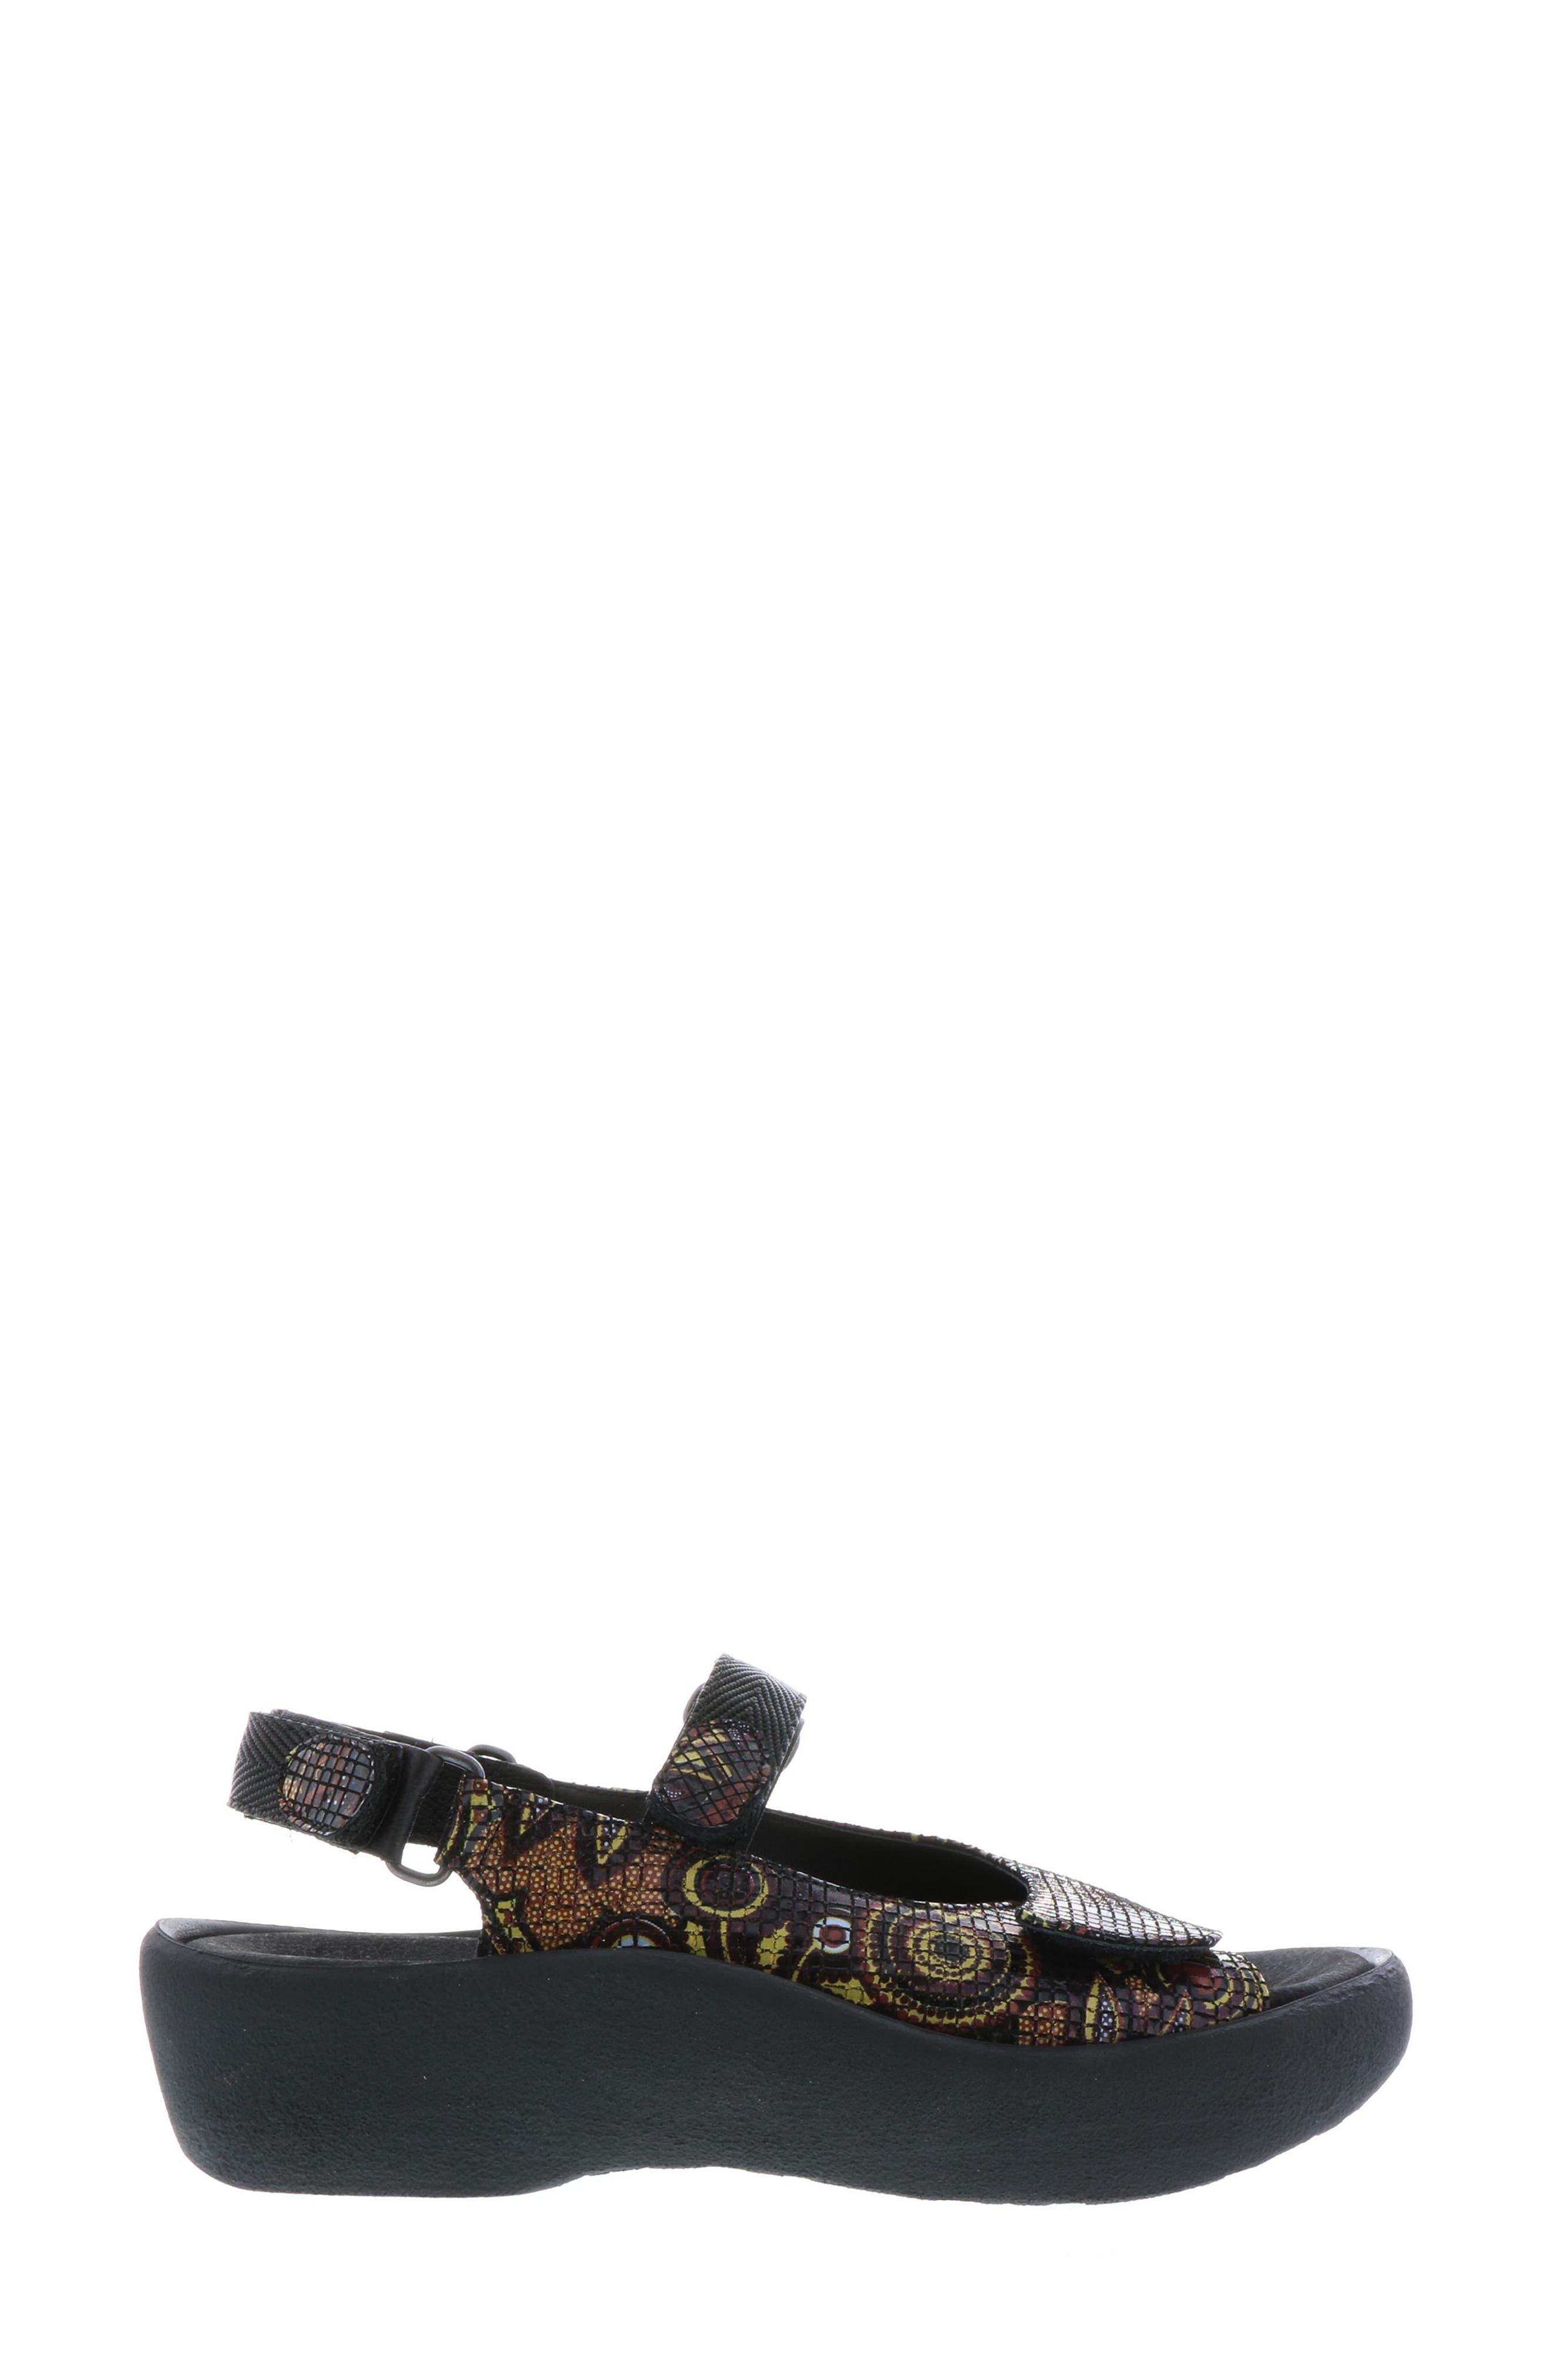 Jewel Sport Sandal,                             Alternate thumbnail 3, color,                             Black Flower Print